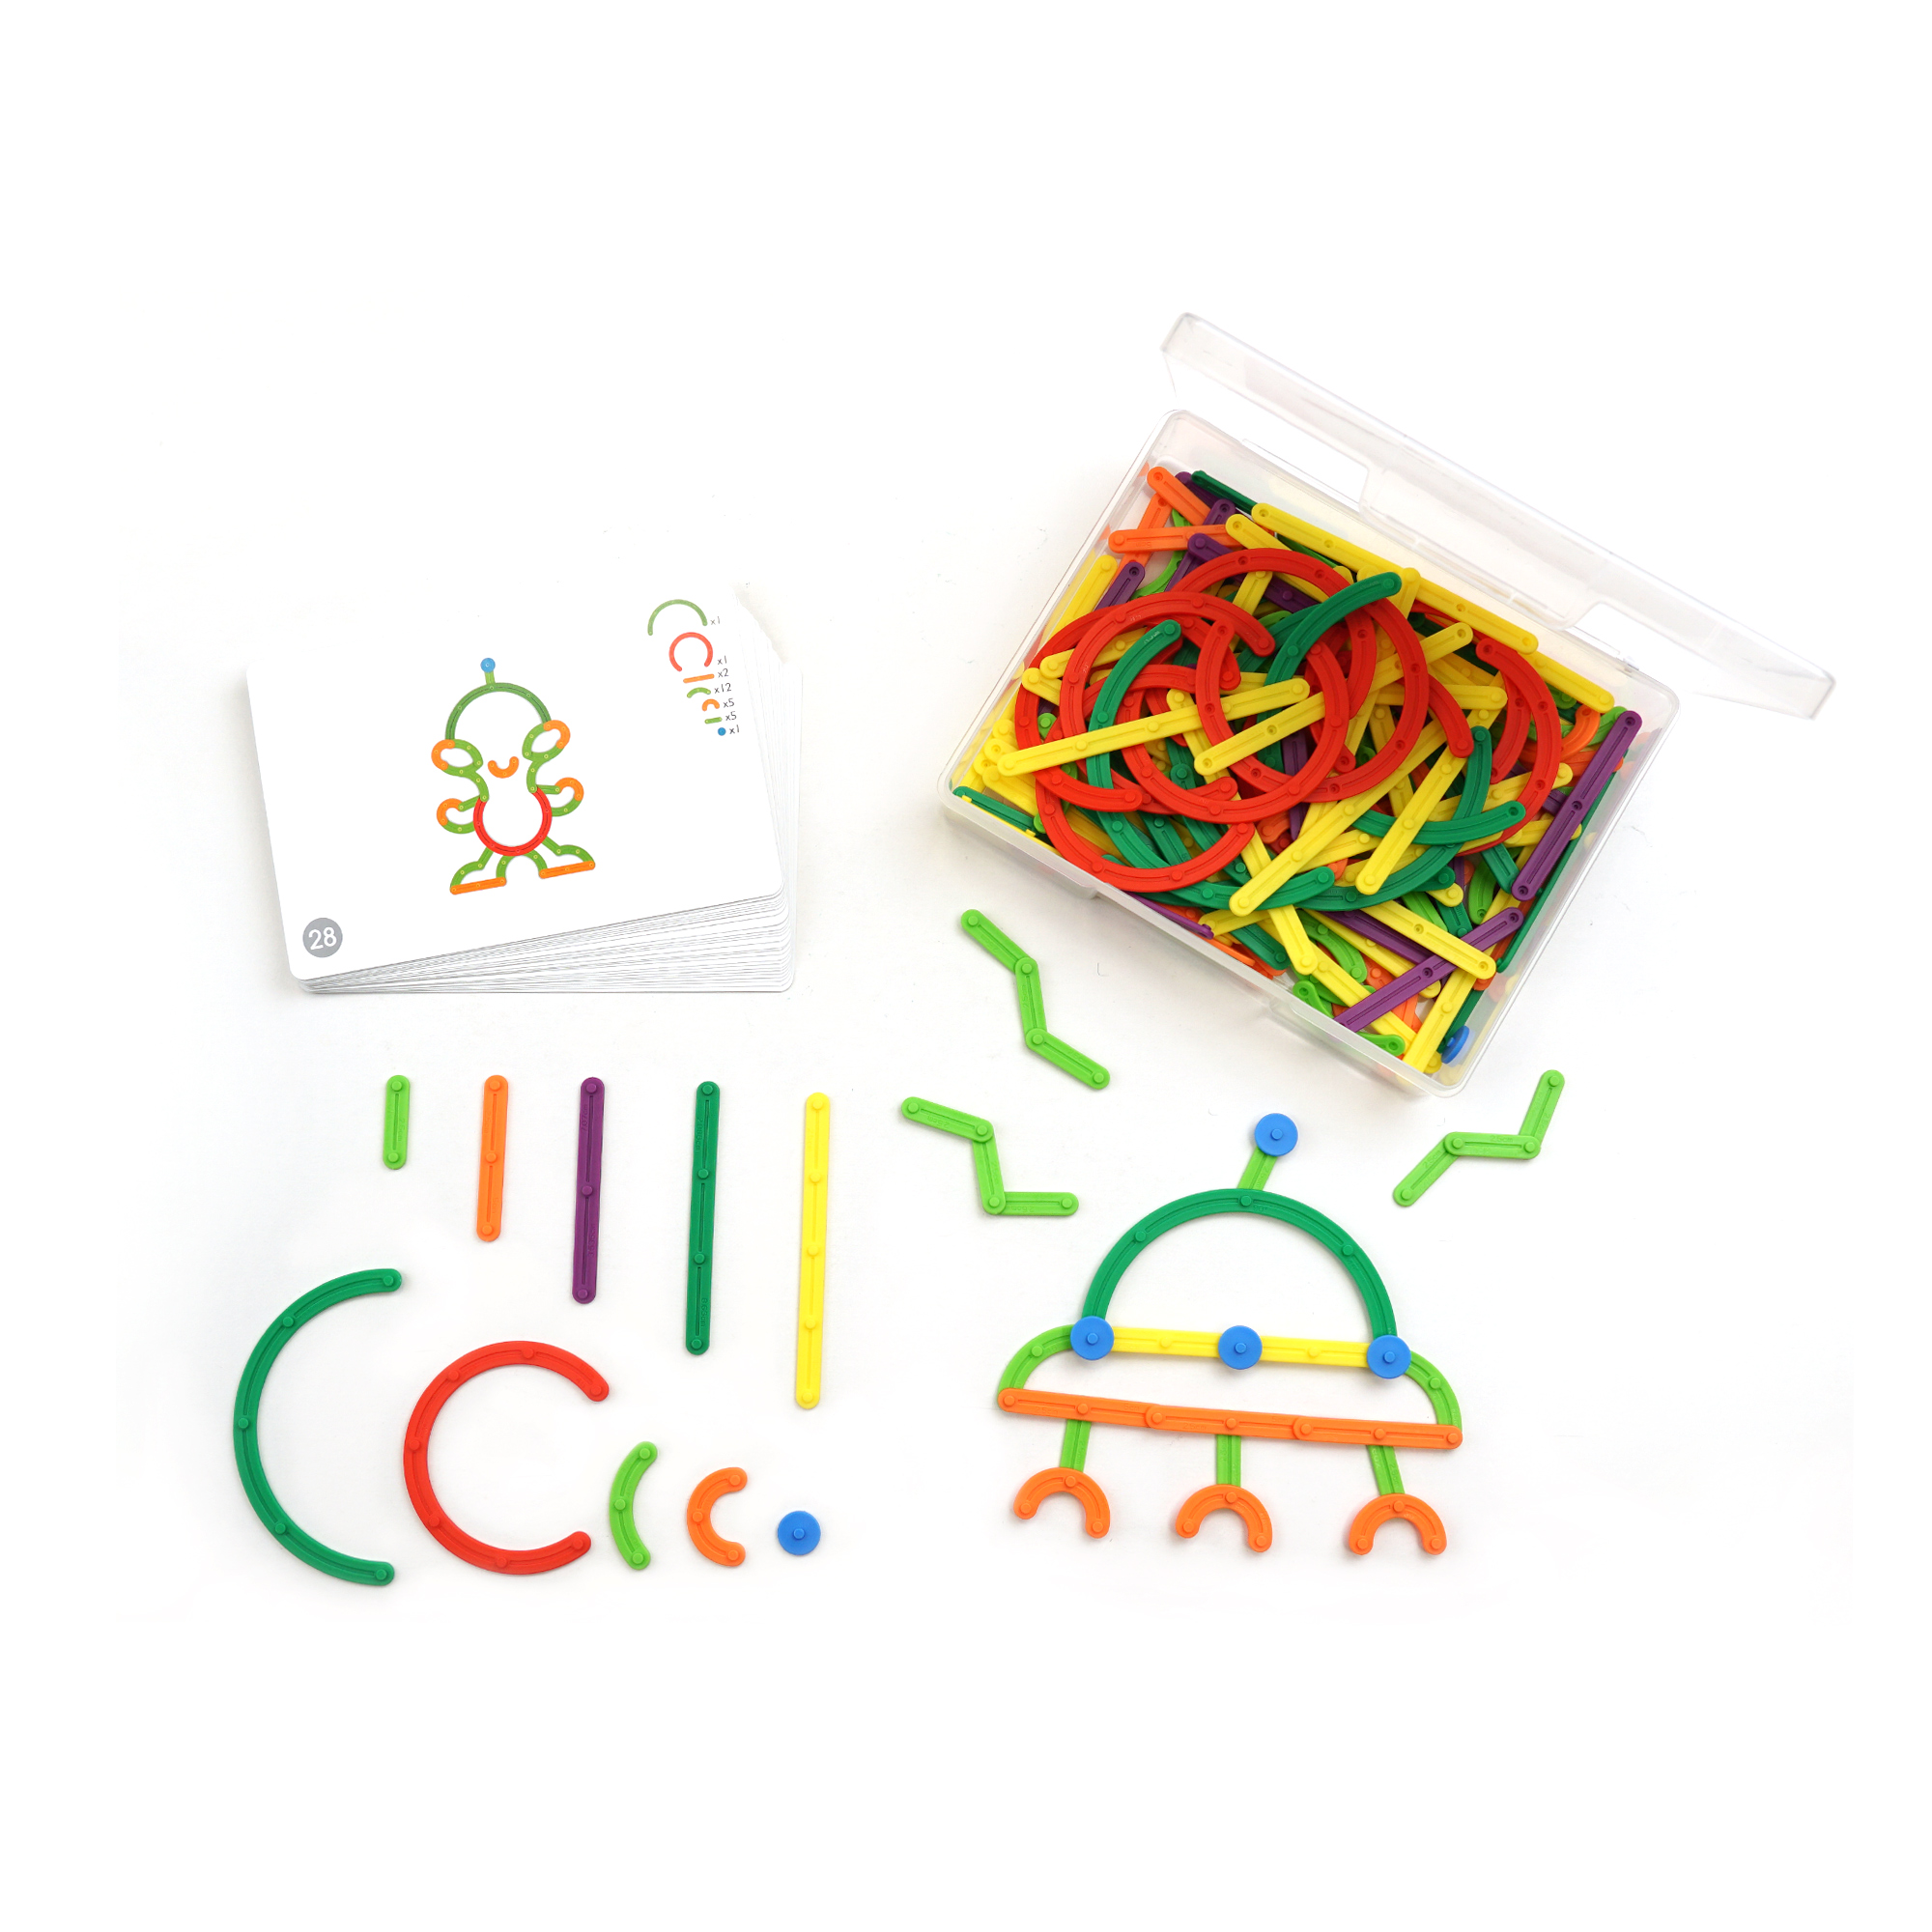 Geostix® Letter & Construction Set